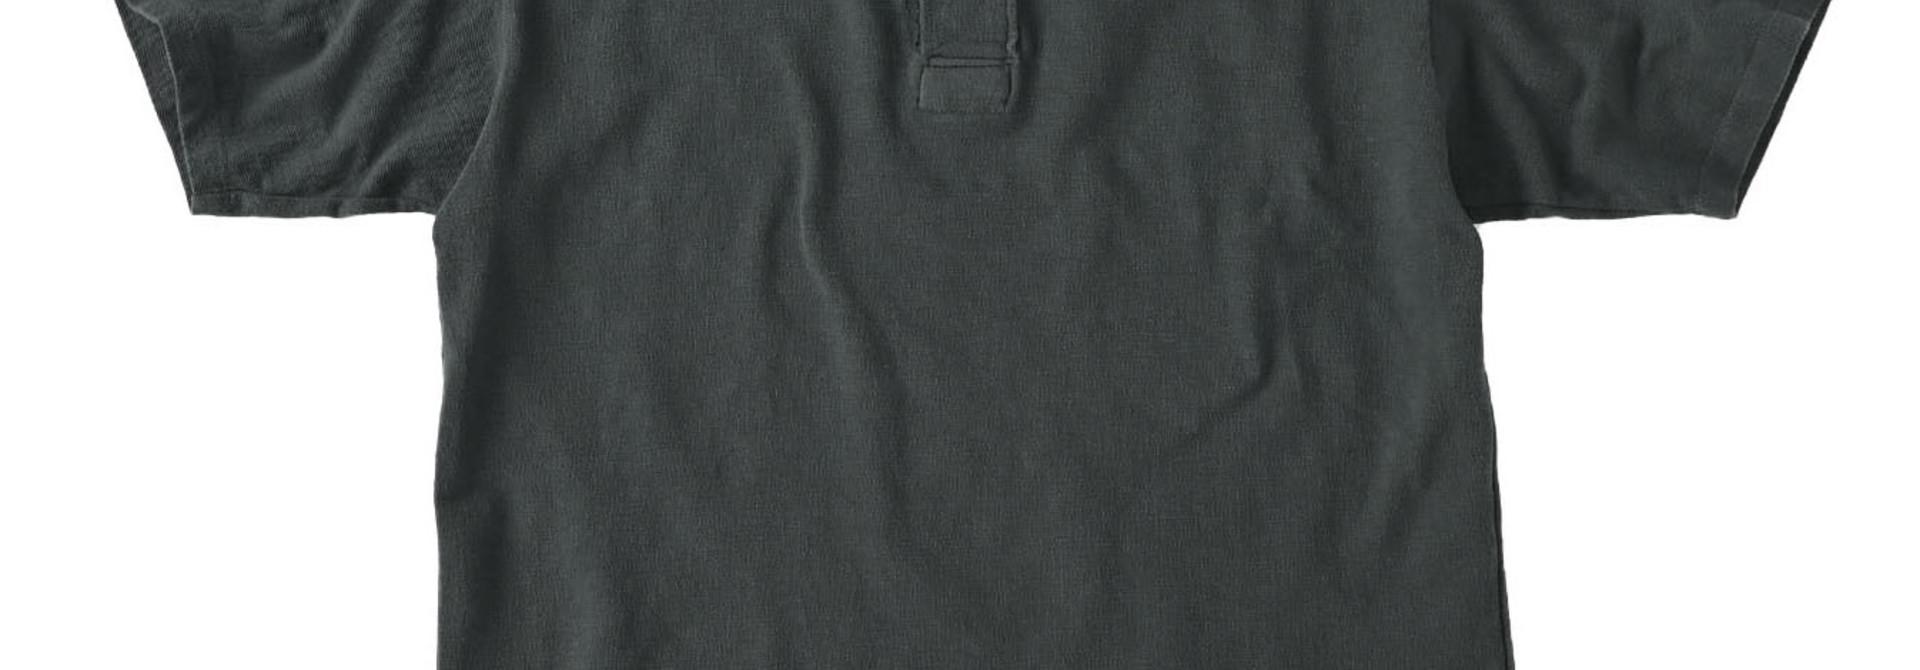 Kanoko Ocean Shiokaze Short-sleeved Polo Shirt (0521)